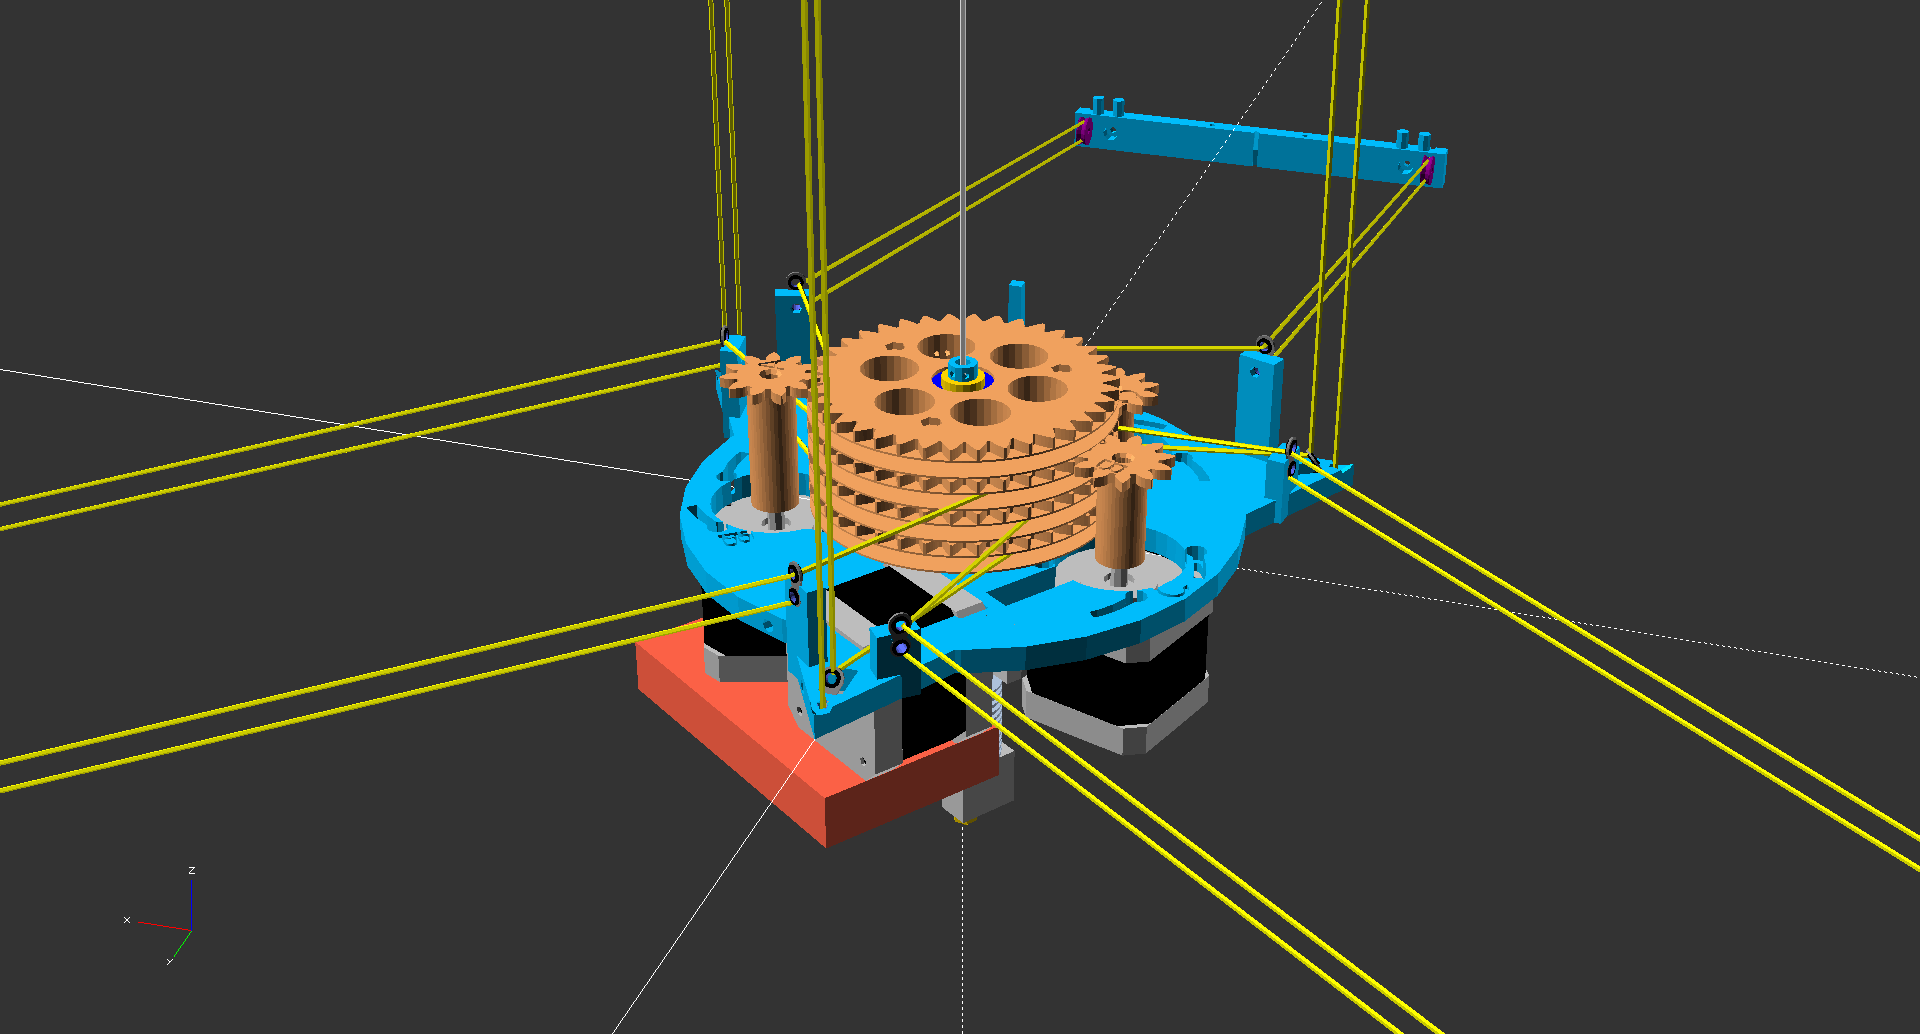 hangprinter assembly